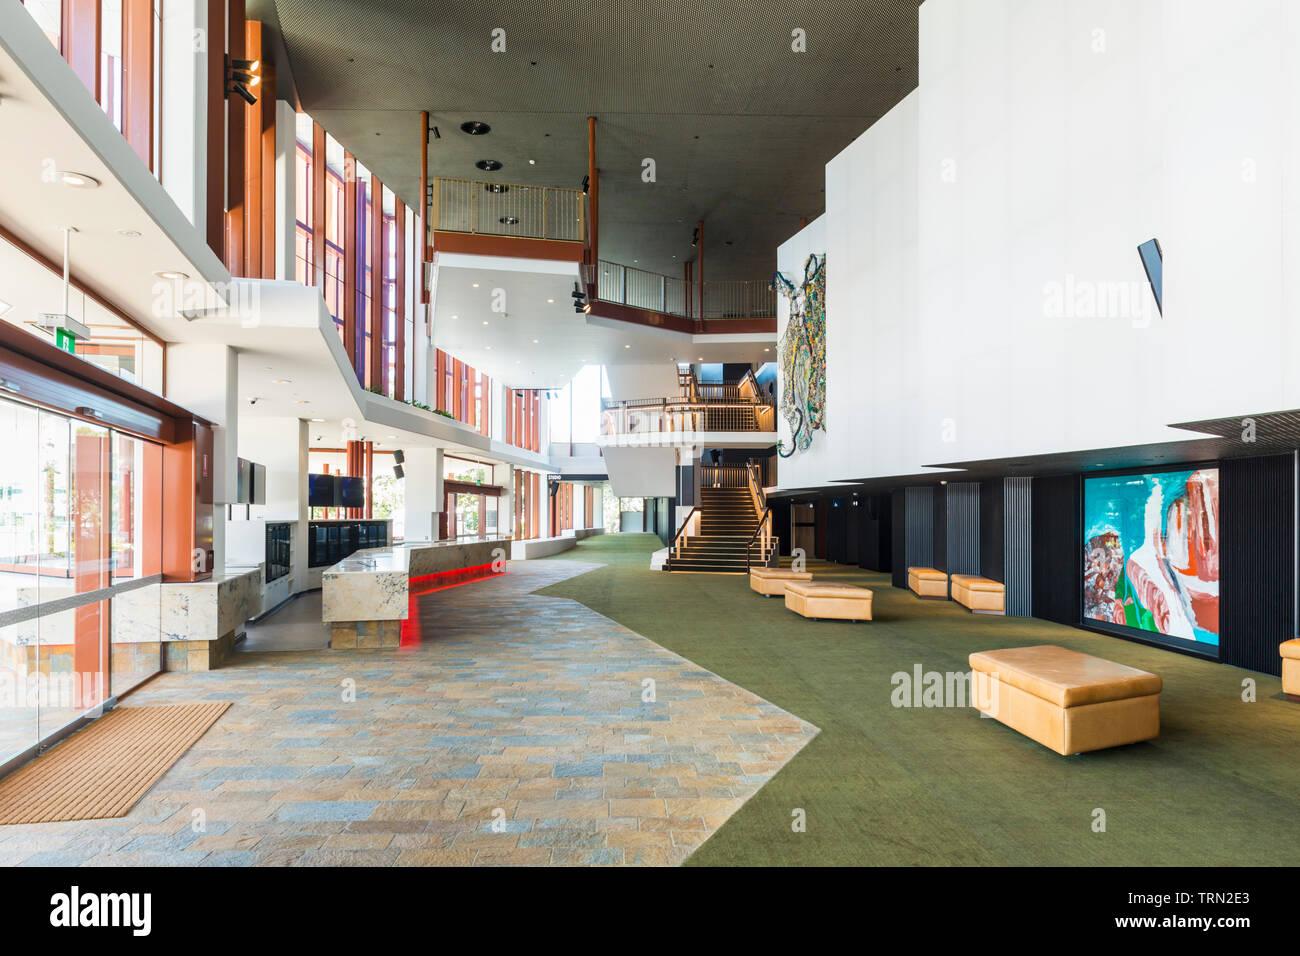 Das Foyer des Cairns Performing Arts Center, die Ende 2018 abgeschlossen. Cairns, Queensland, Australien Stockfoto